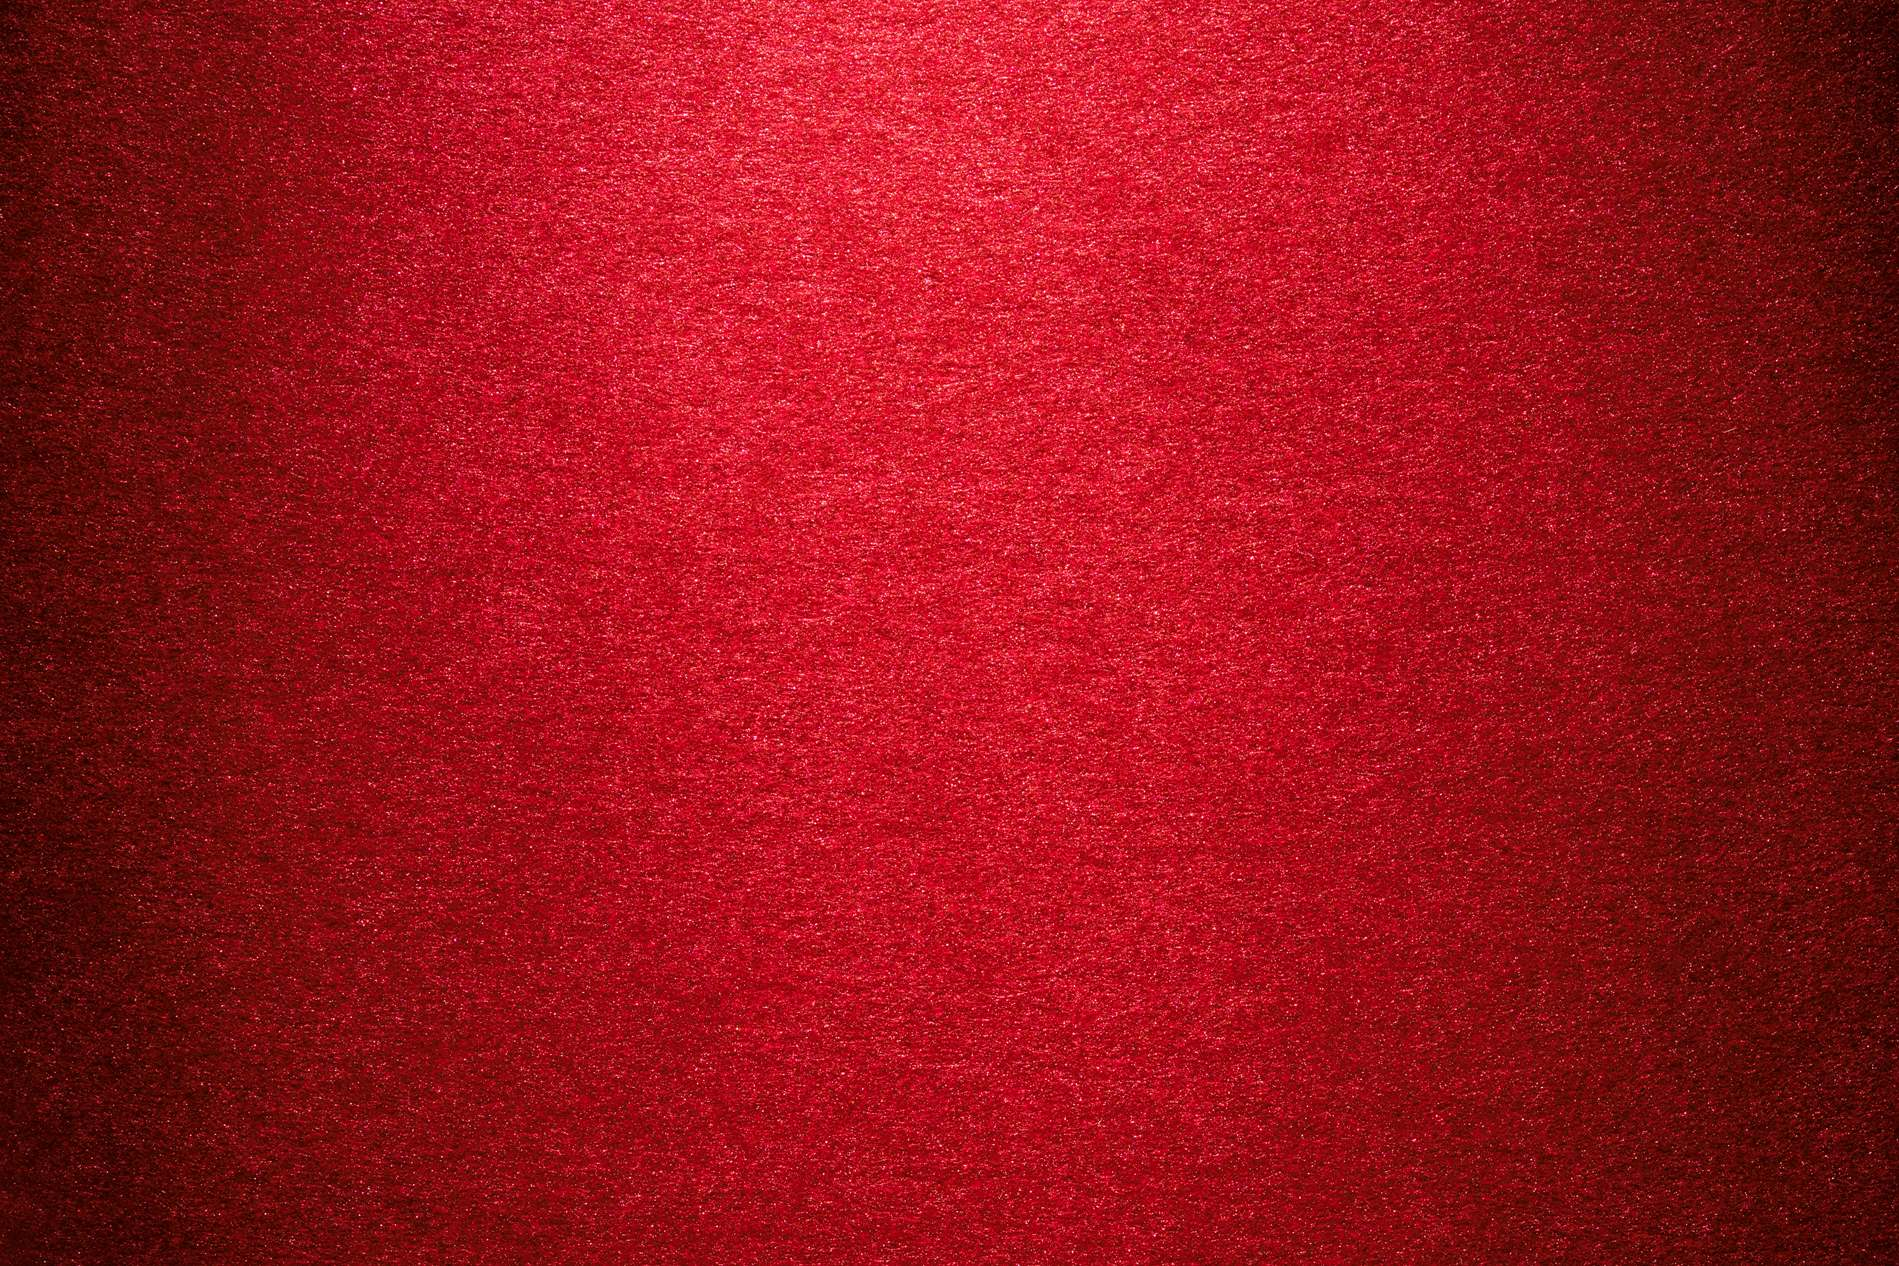 Red Retro Background